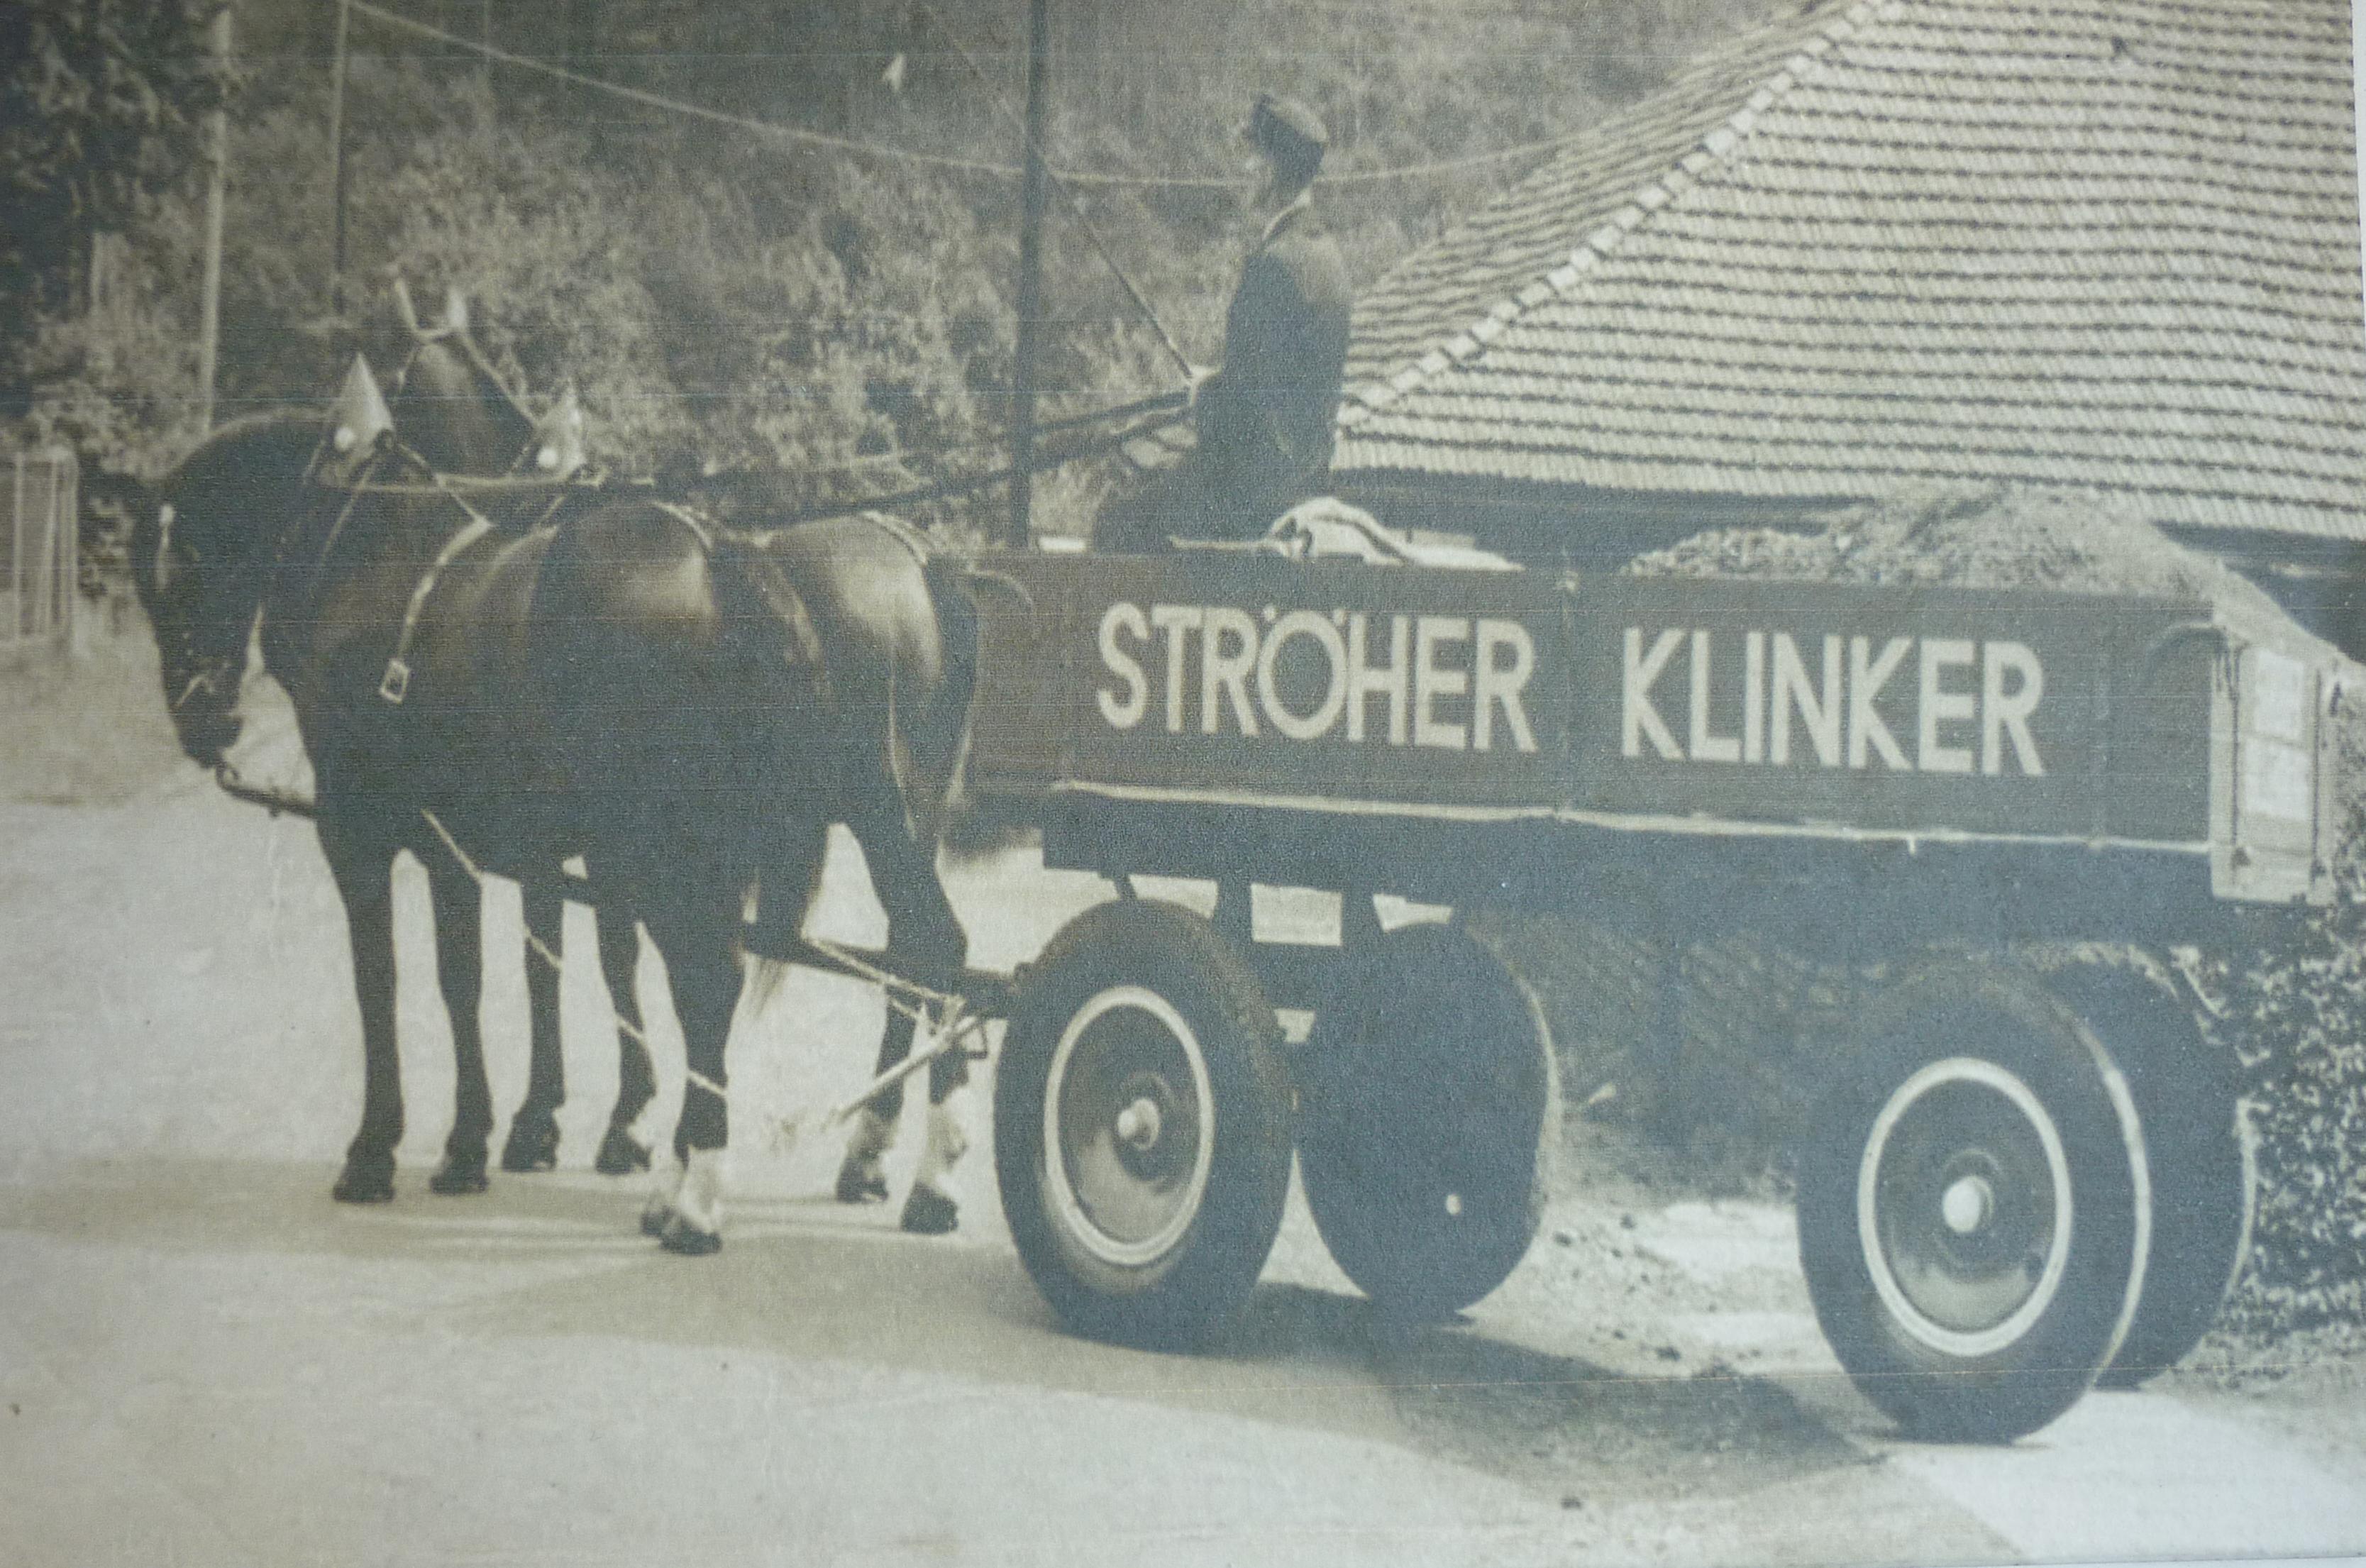 Stroher Klinker